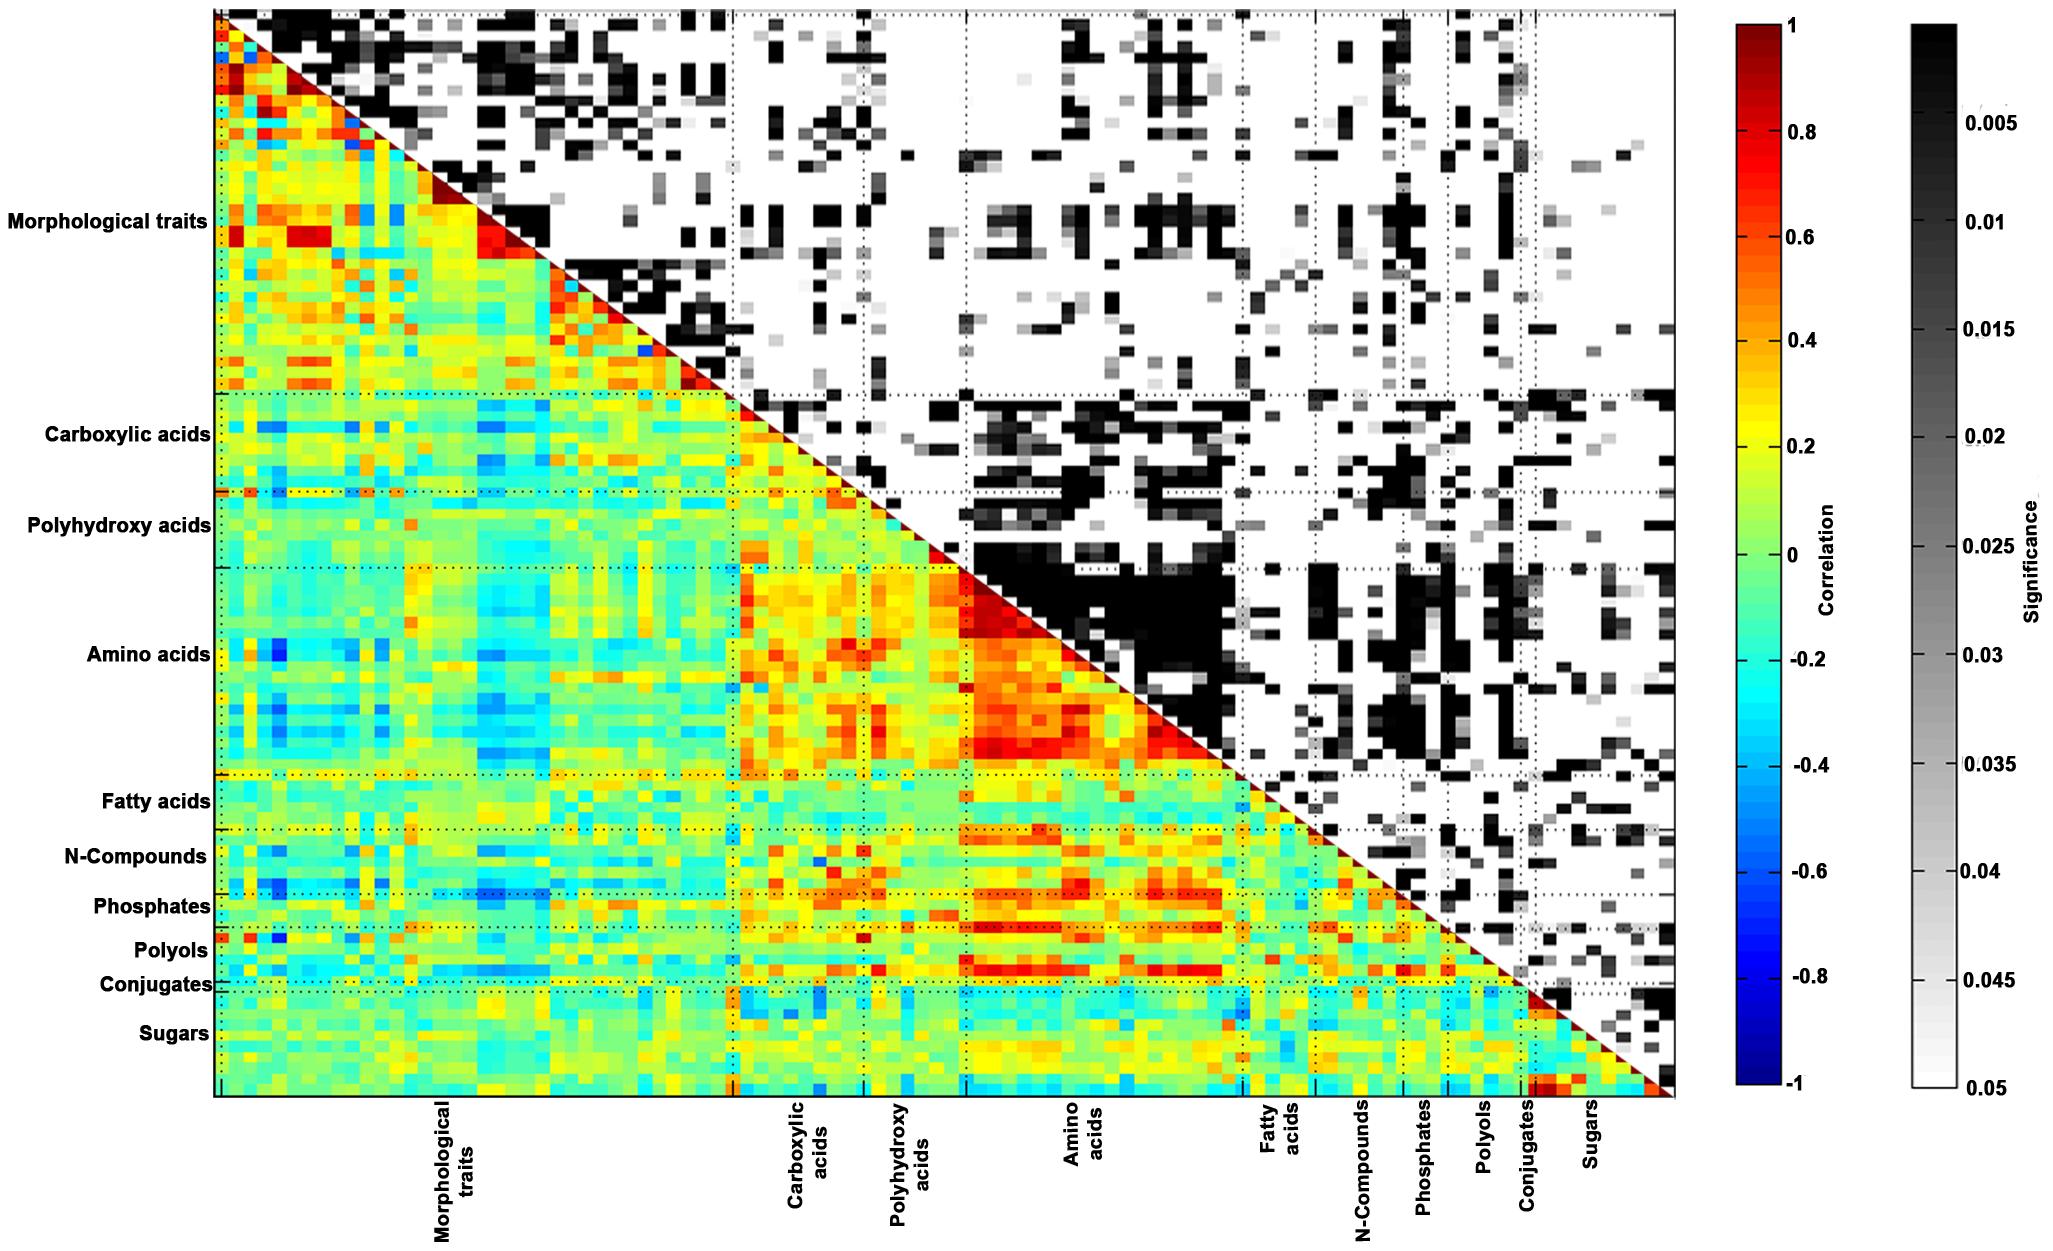 Morphological traits—metabolite correlation/significance.